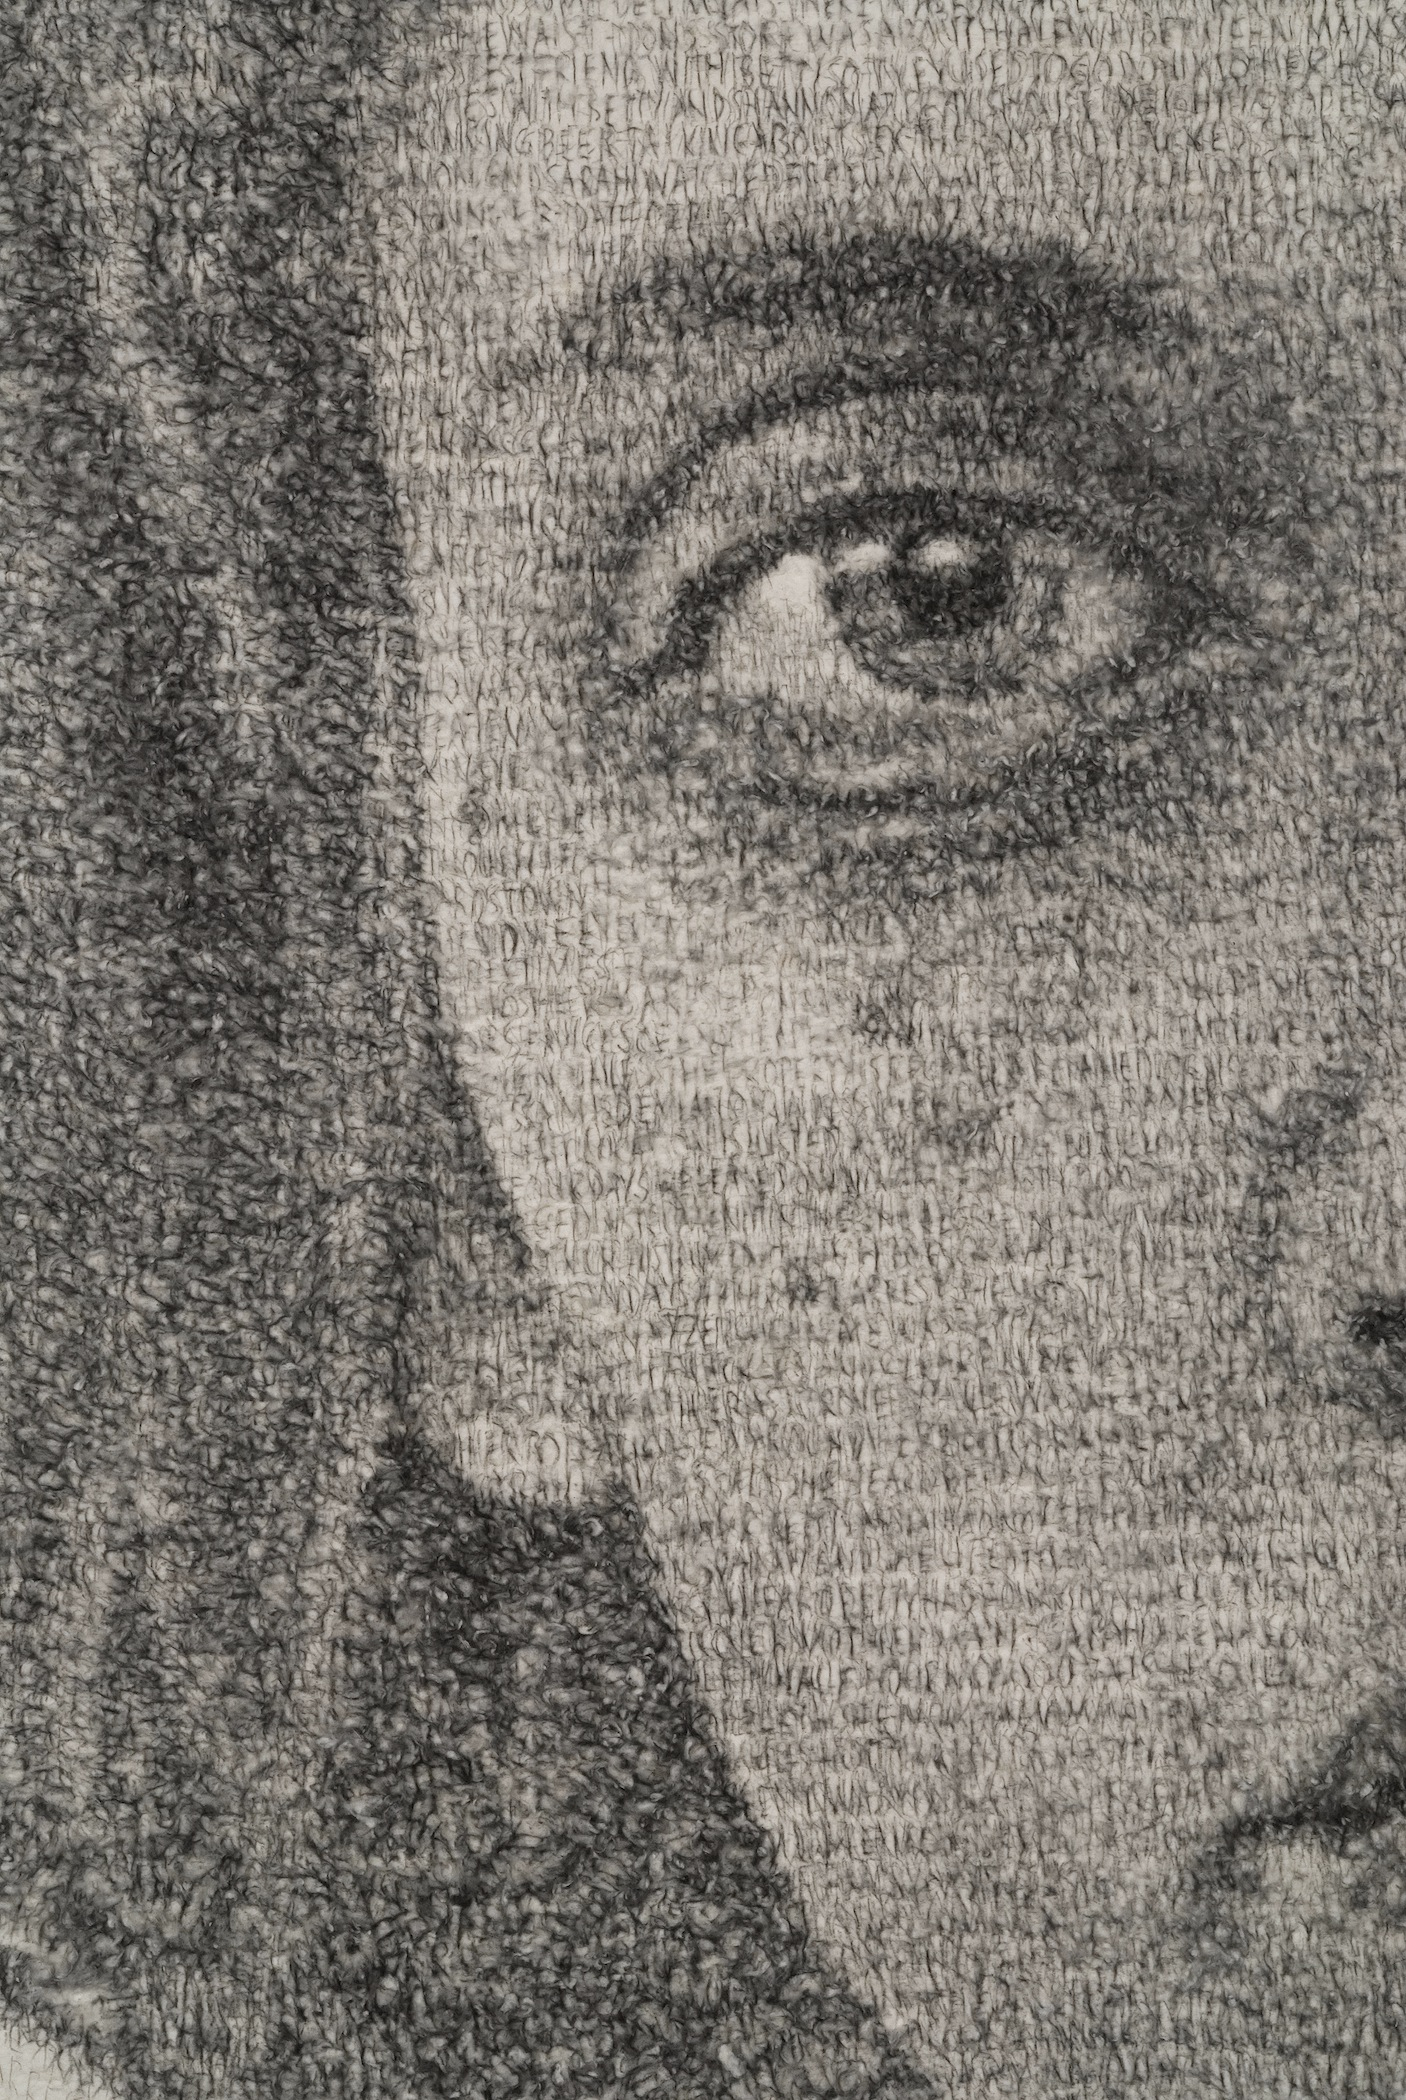 Ben Durham awarded Pollock-Krasner Foundation grant